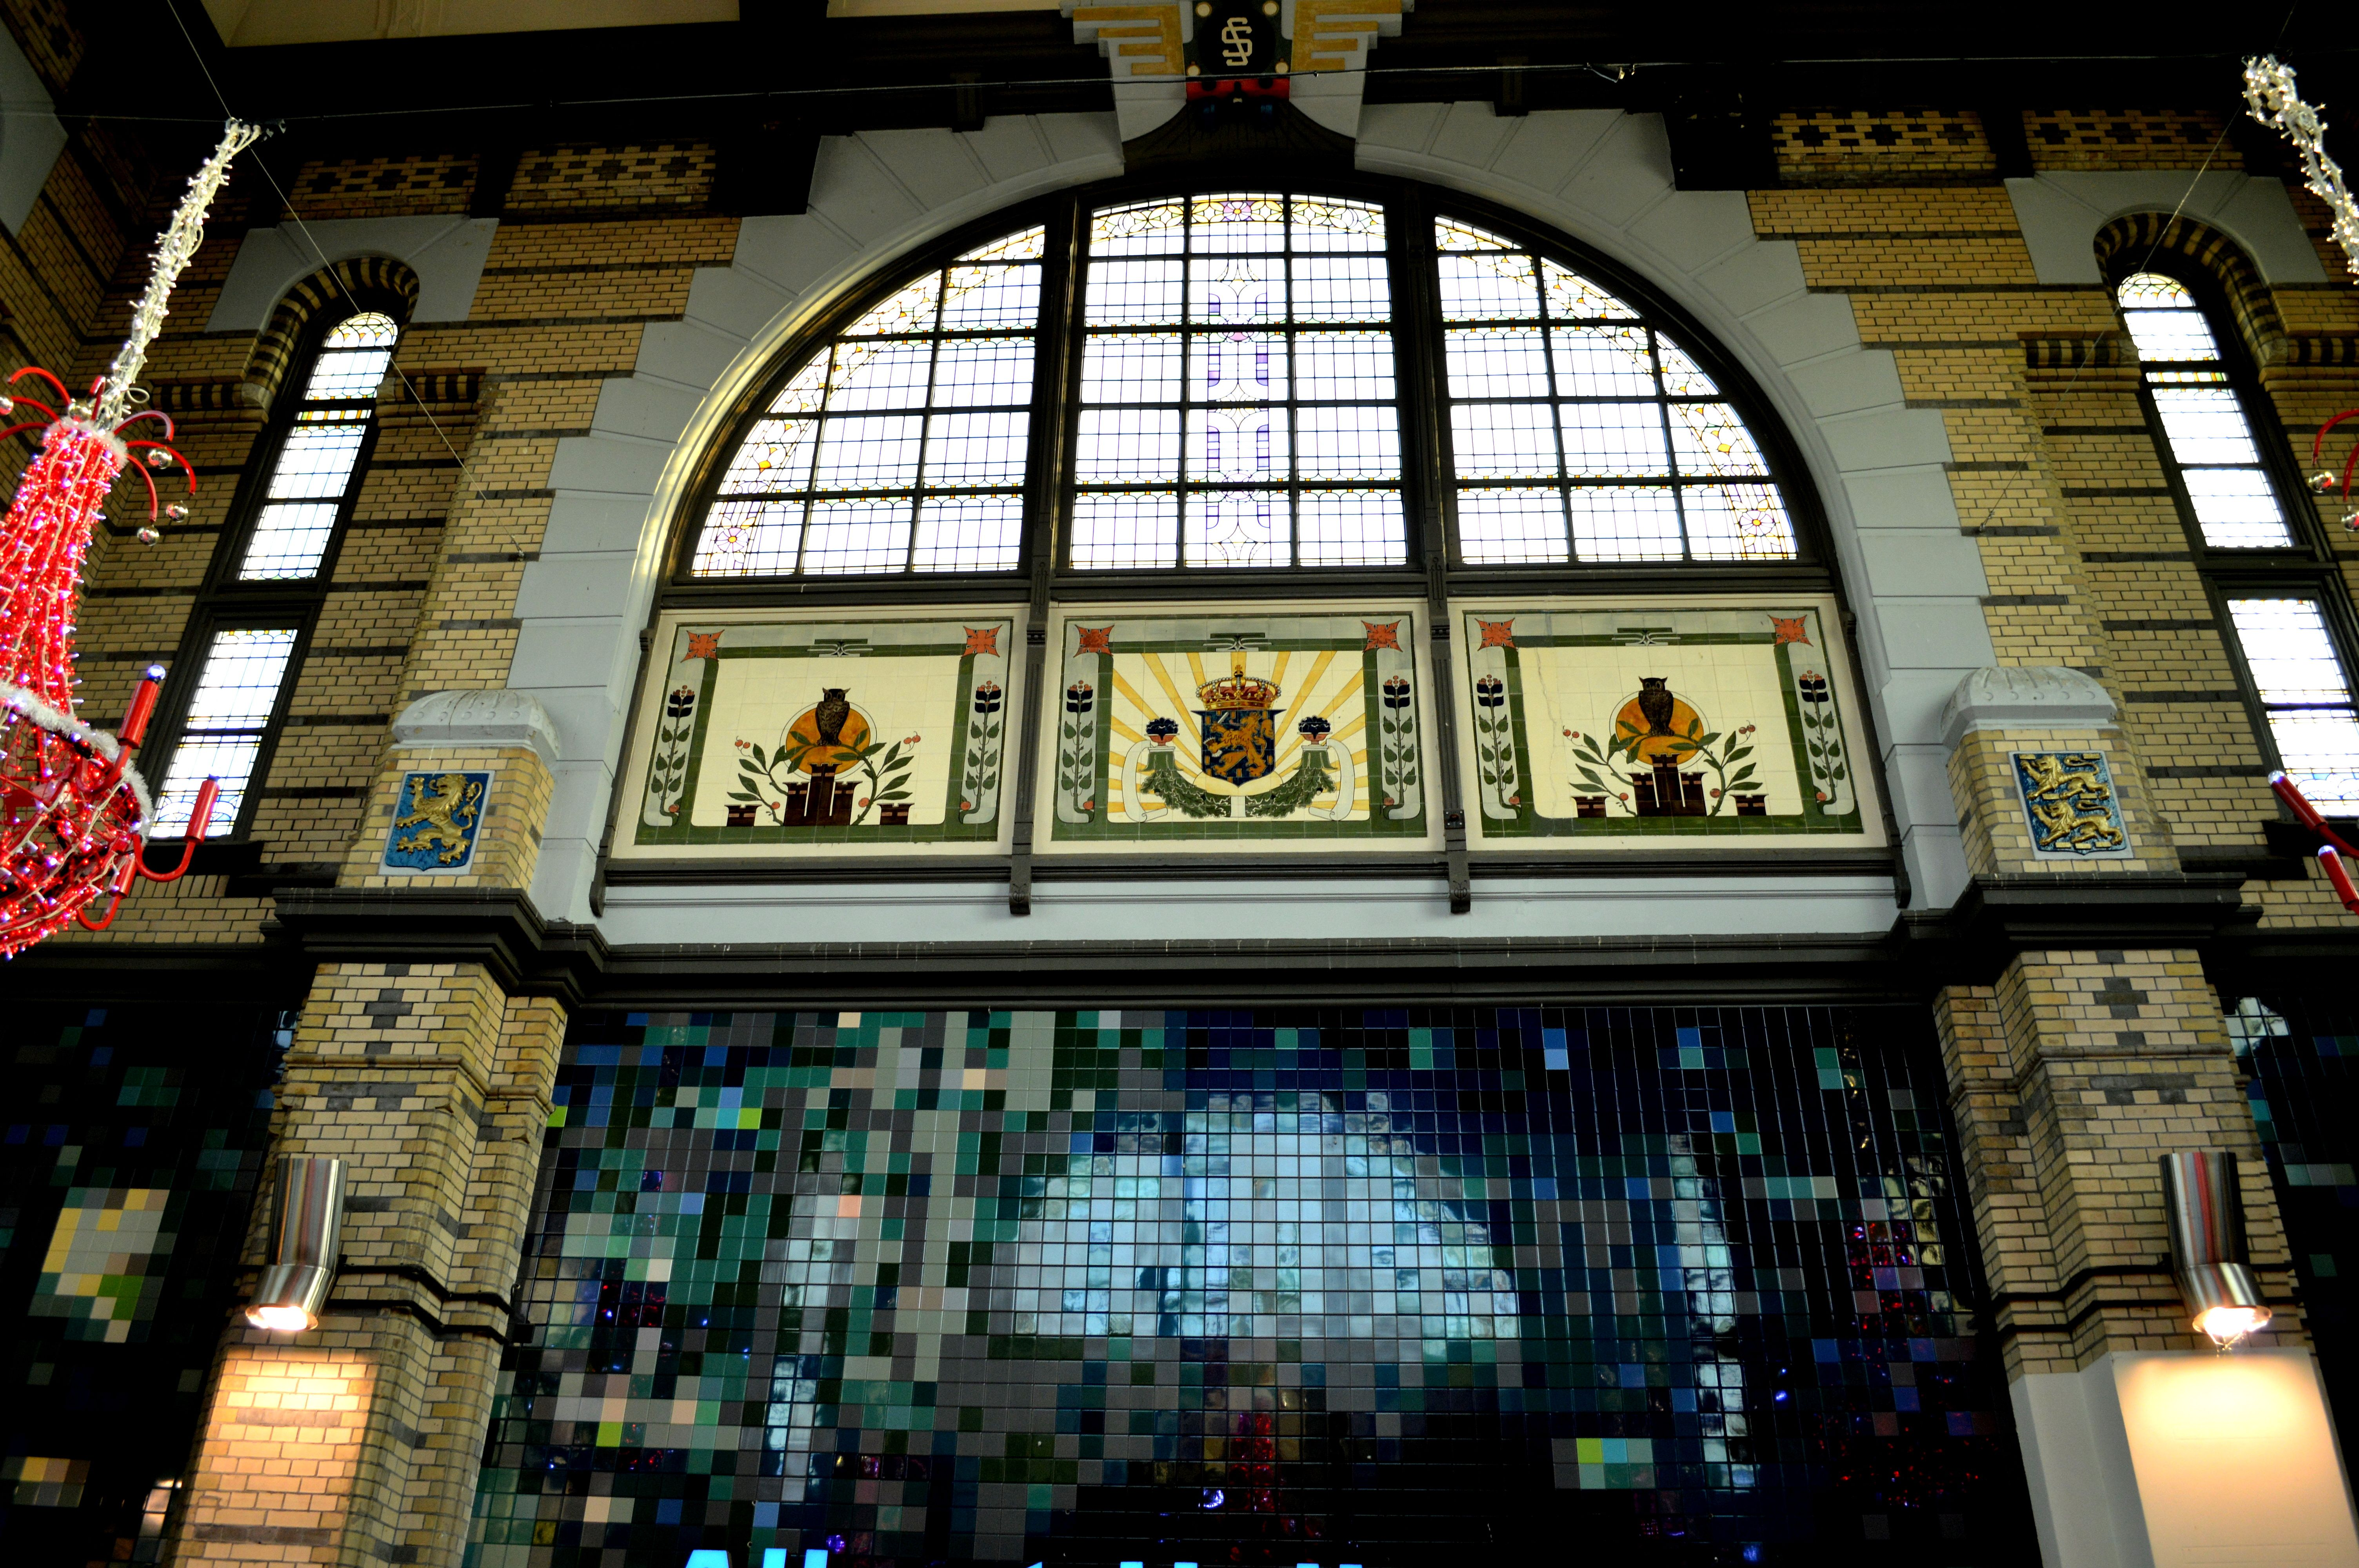 Station Leeuwarden, de hal vind ik altijd mooi aan dit station.